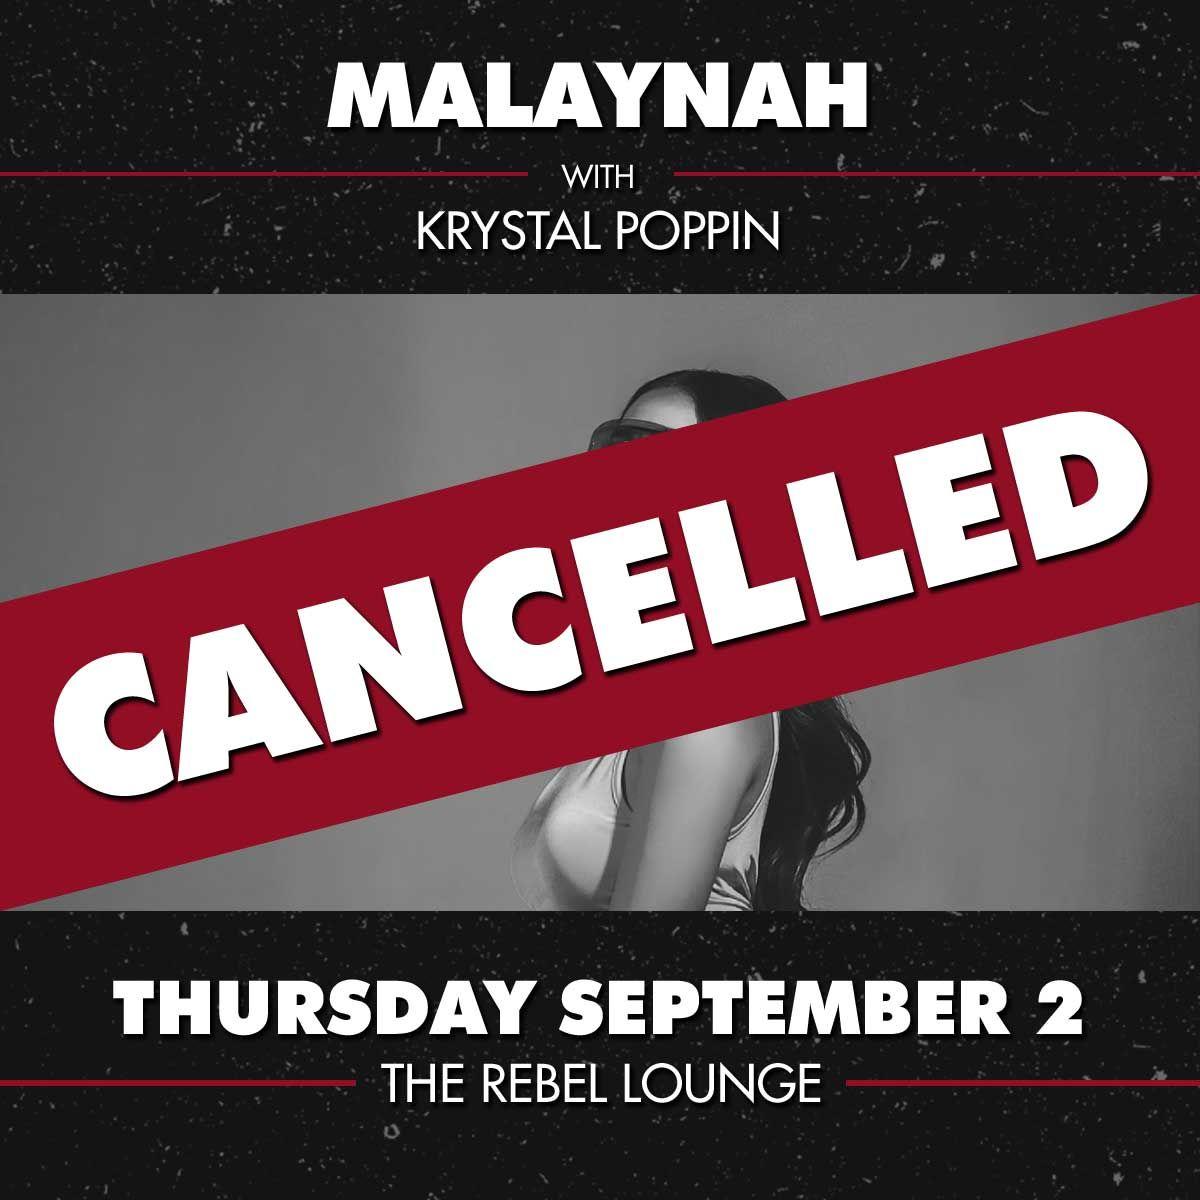 CANCELLED: MALAYNAH: